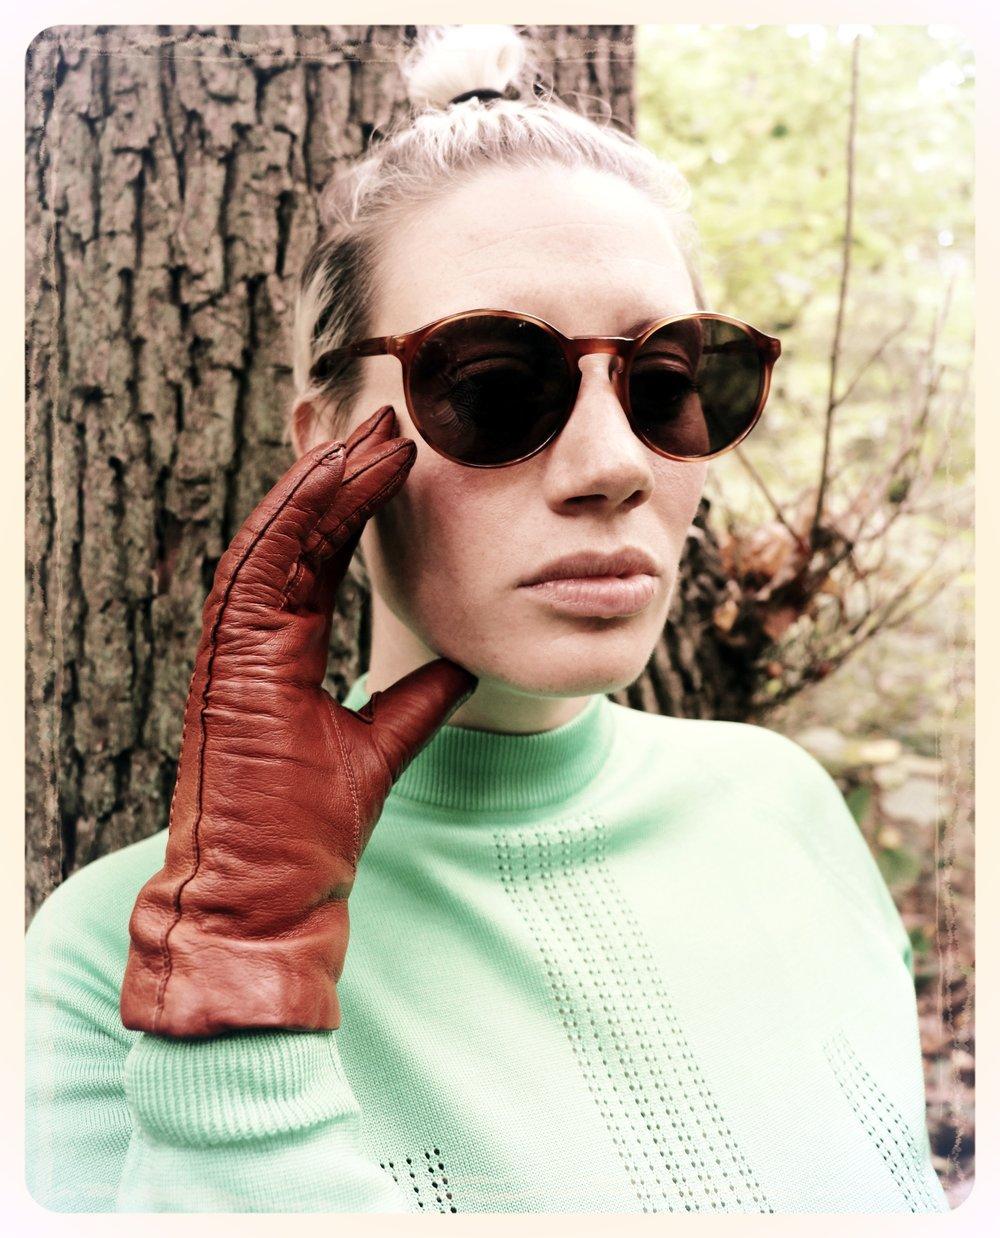 Peep Eyewear, Vintage Sunglasses, 1960s, Aubrey AW, Worn against a tree, Autumn Winter collection